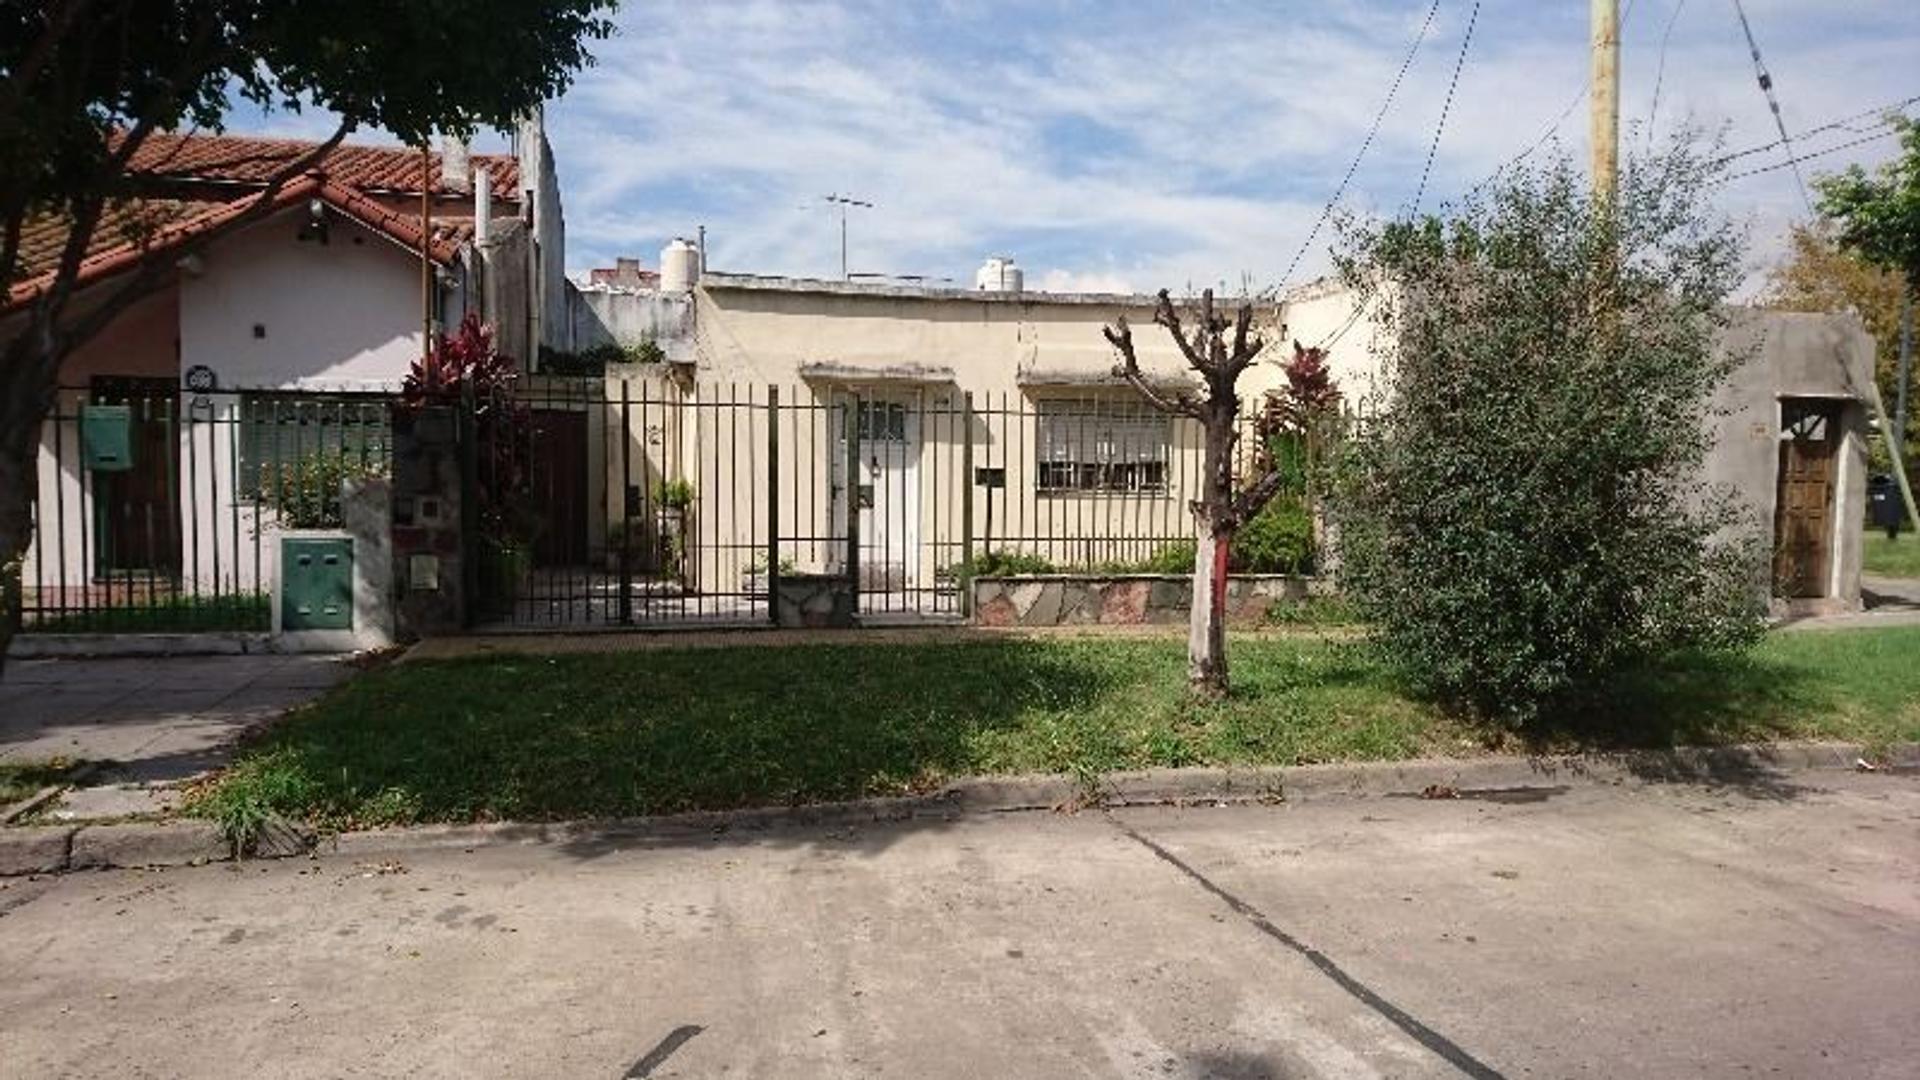 Casa sobre lote 8.66x17 - VENTA